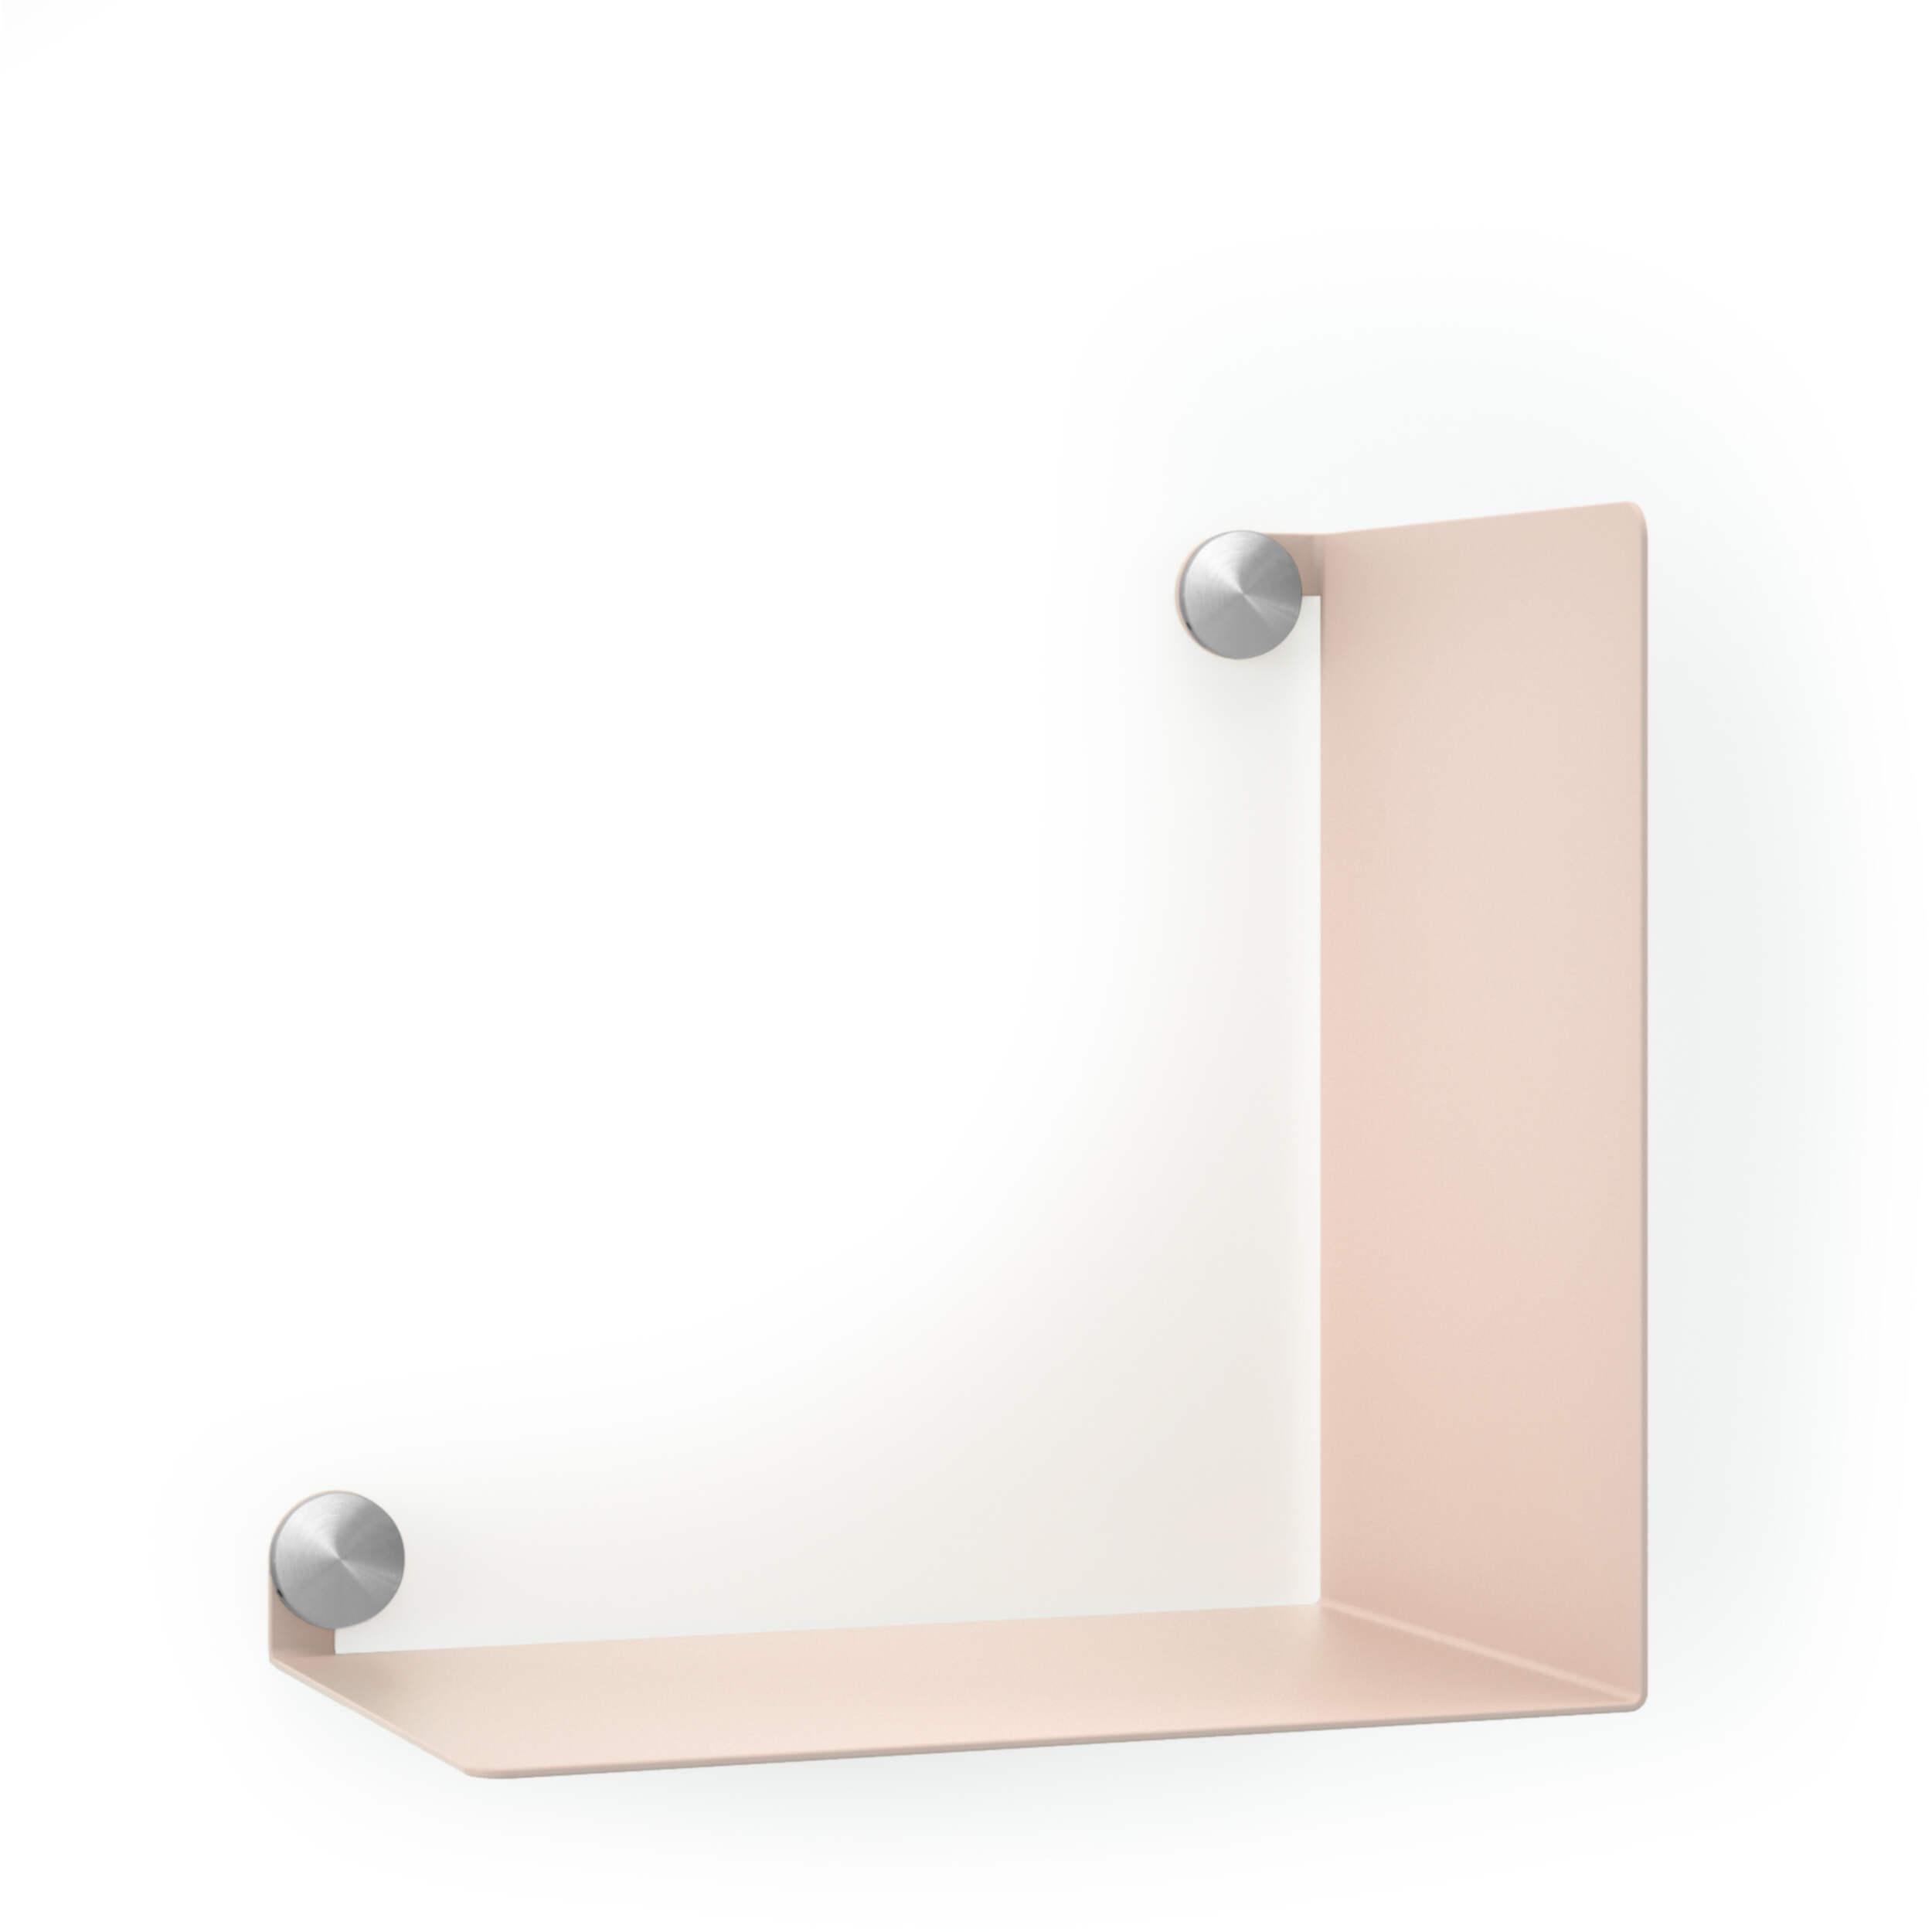 Mensola ELLE ACCIAIO, 30x20xH30 cm, NERO OPACO, viti Button